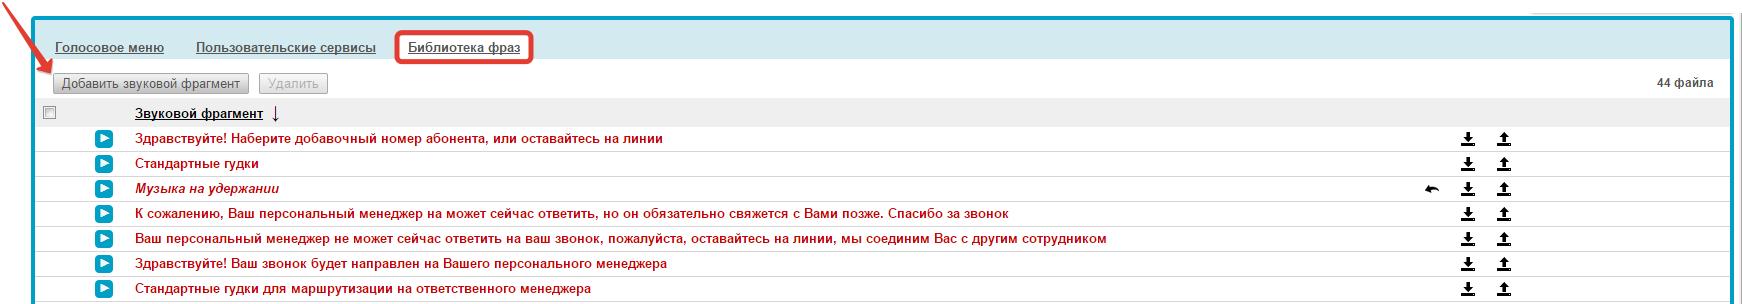 2015-01-12 13-47-58 https   yourcompany.gravitel.ru #admin voicemenu media - Google Chrome